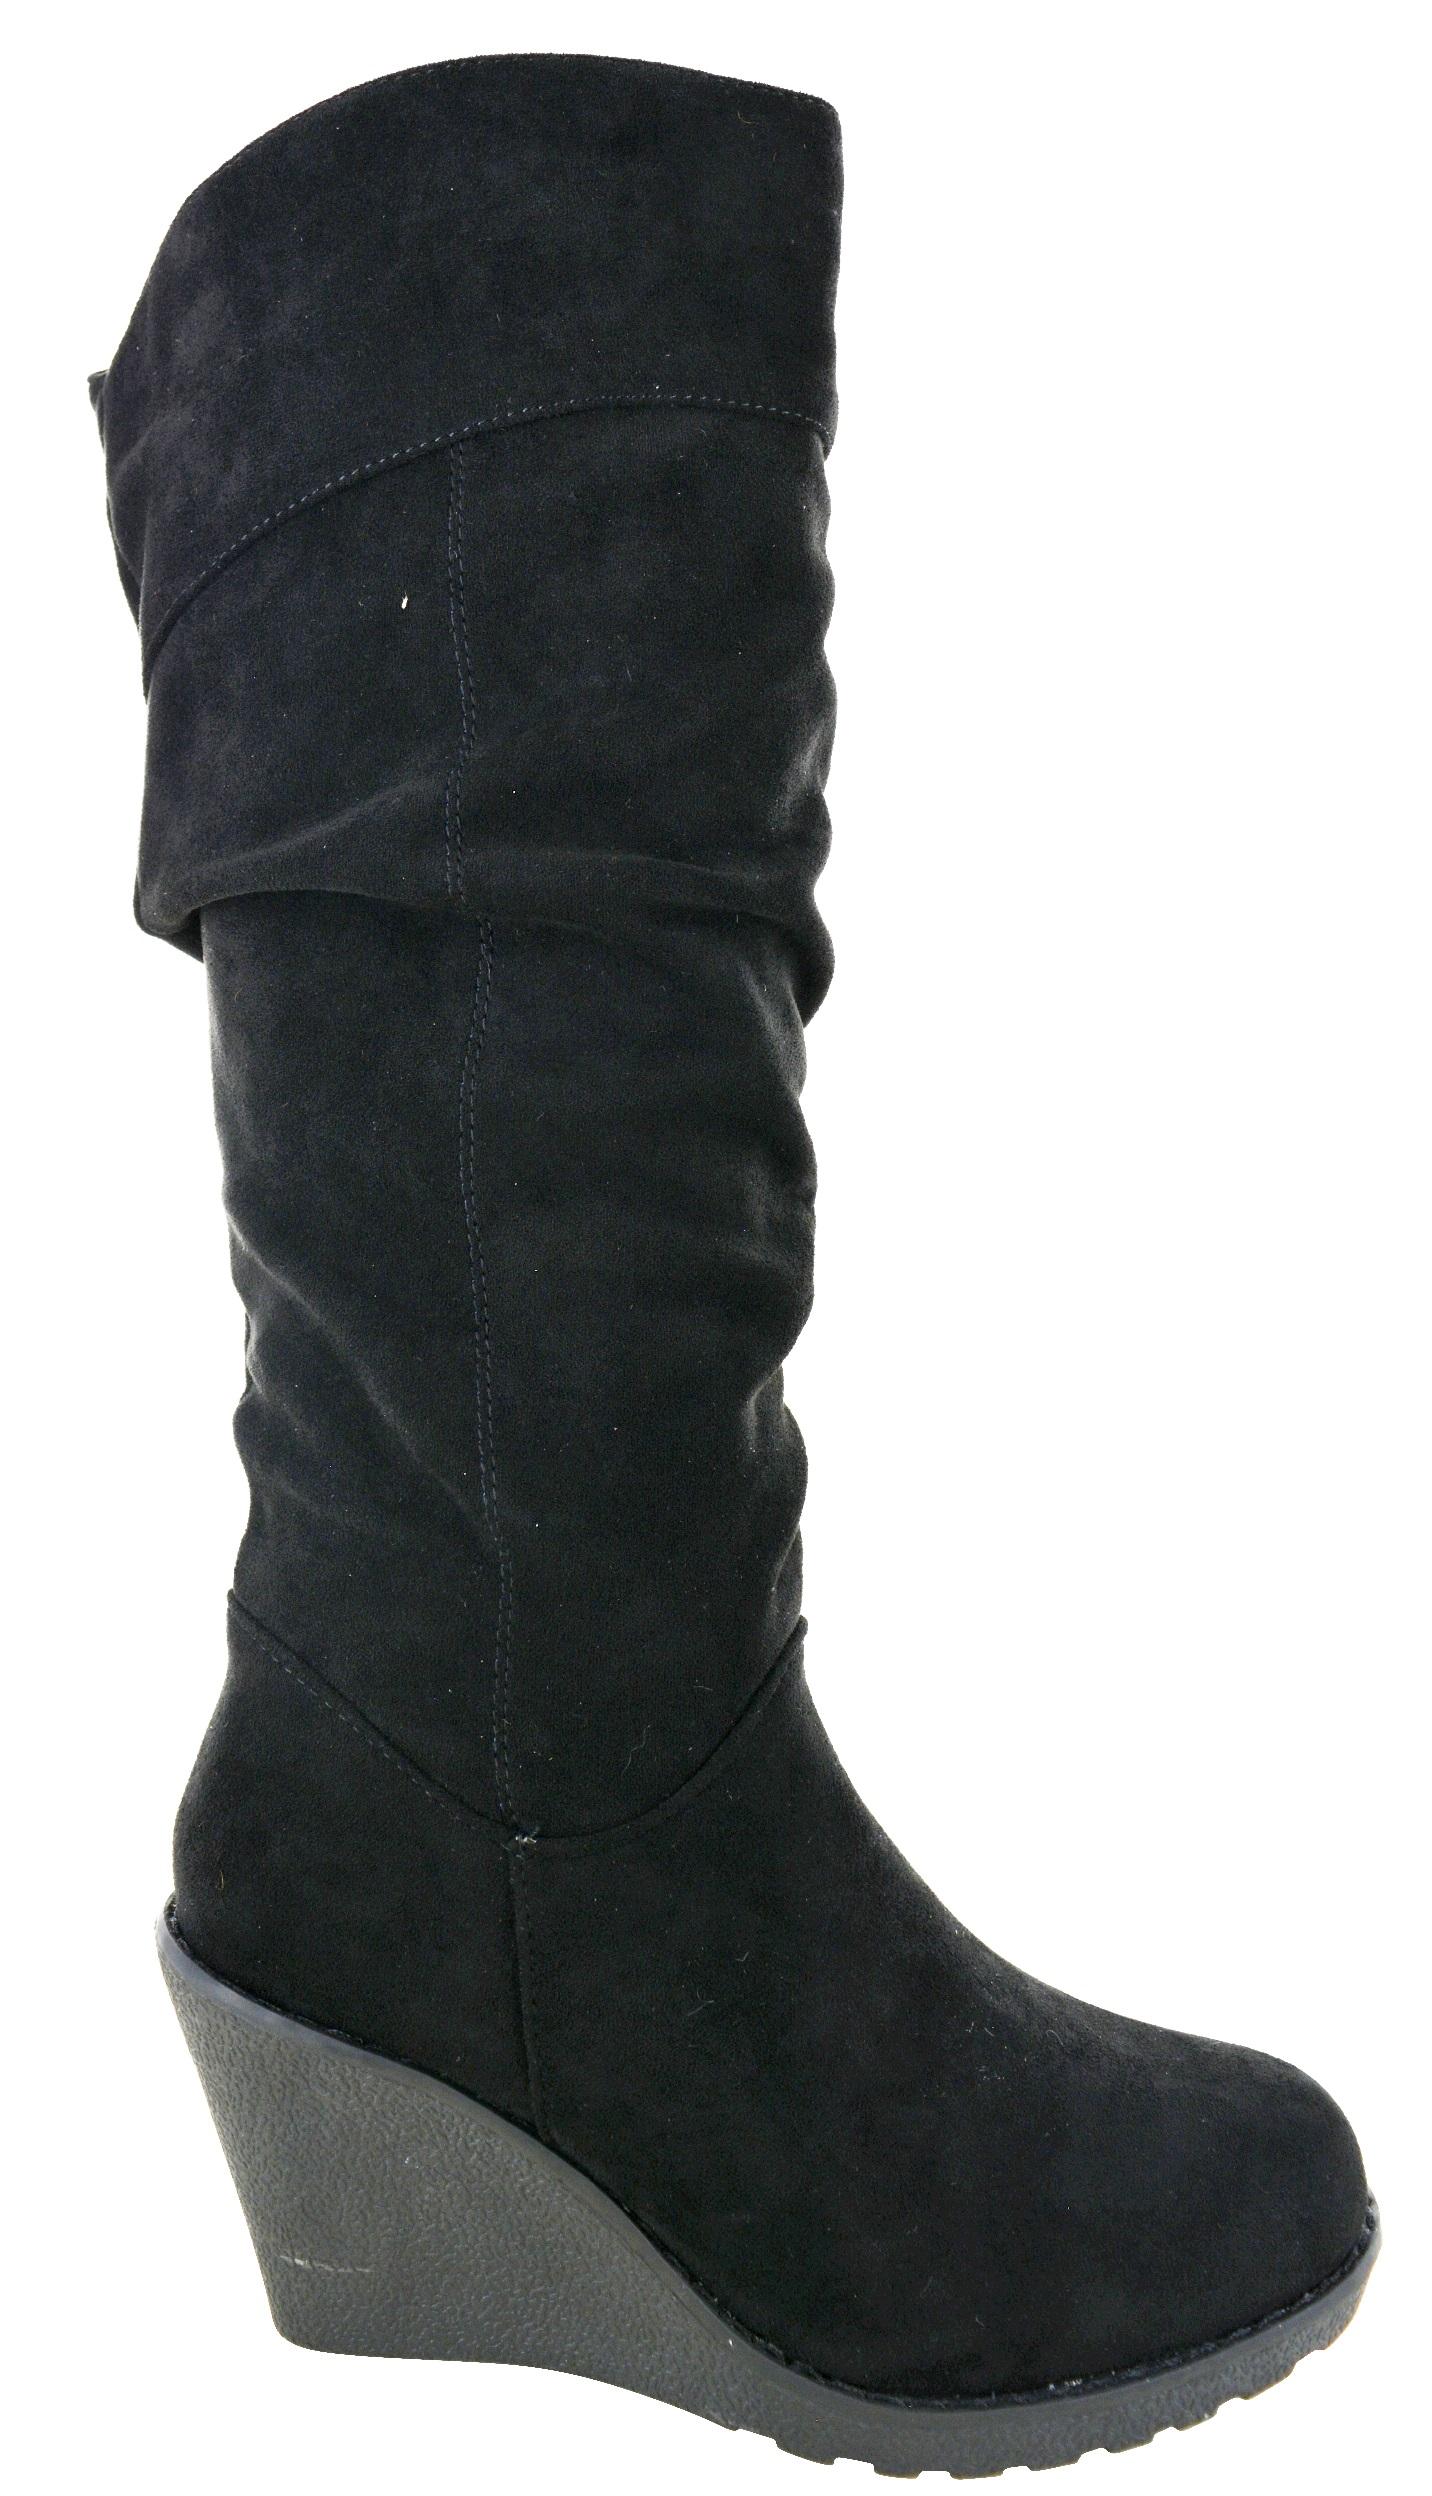 Čižmy na platforme Black Suede – Sissy Boutique bcb7e4d8164